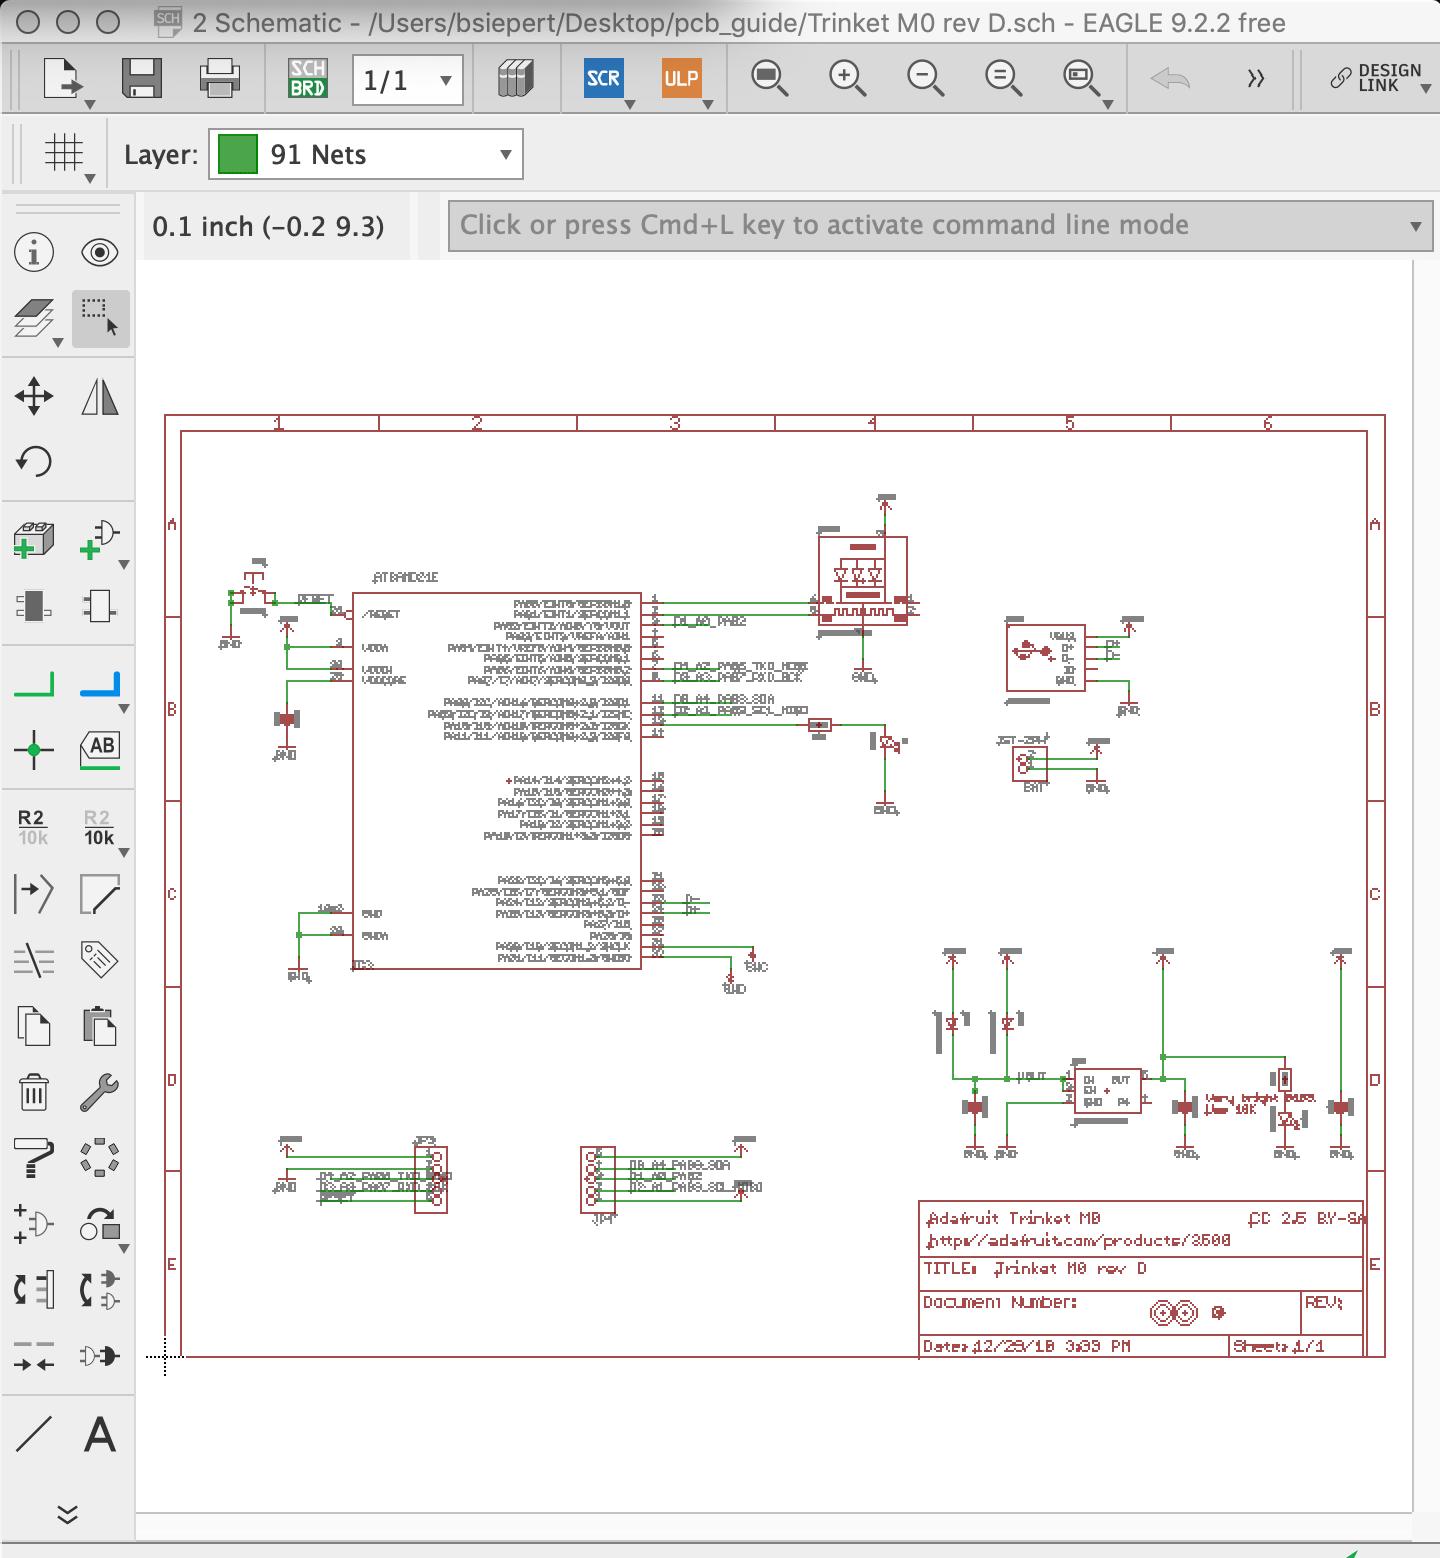 manufacturing_Screen_Shot_2018-12-31_at_3.33.59_PM.png